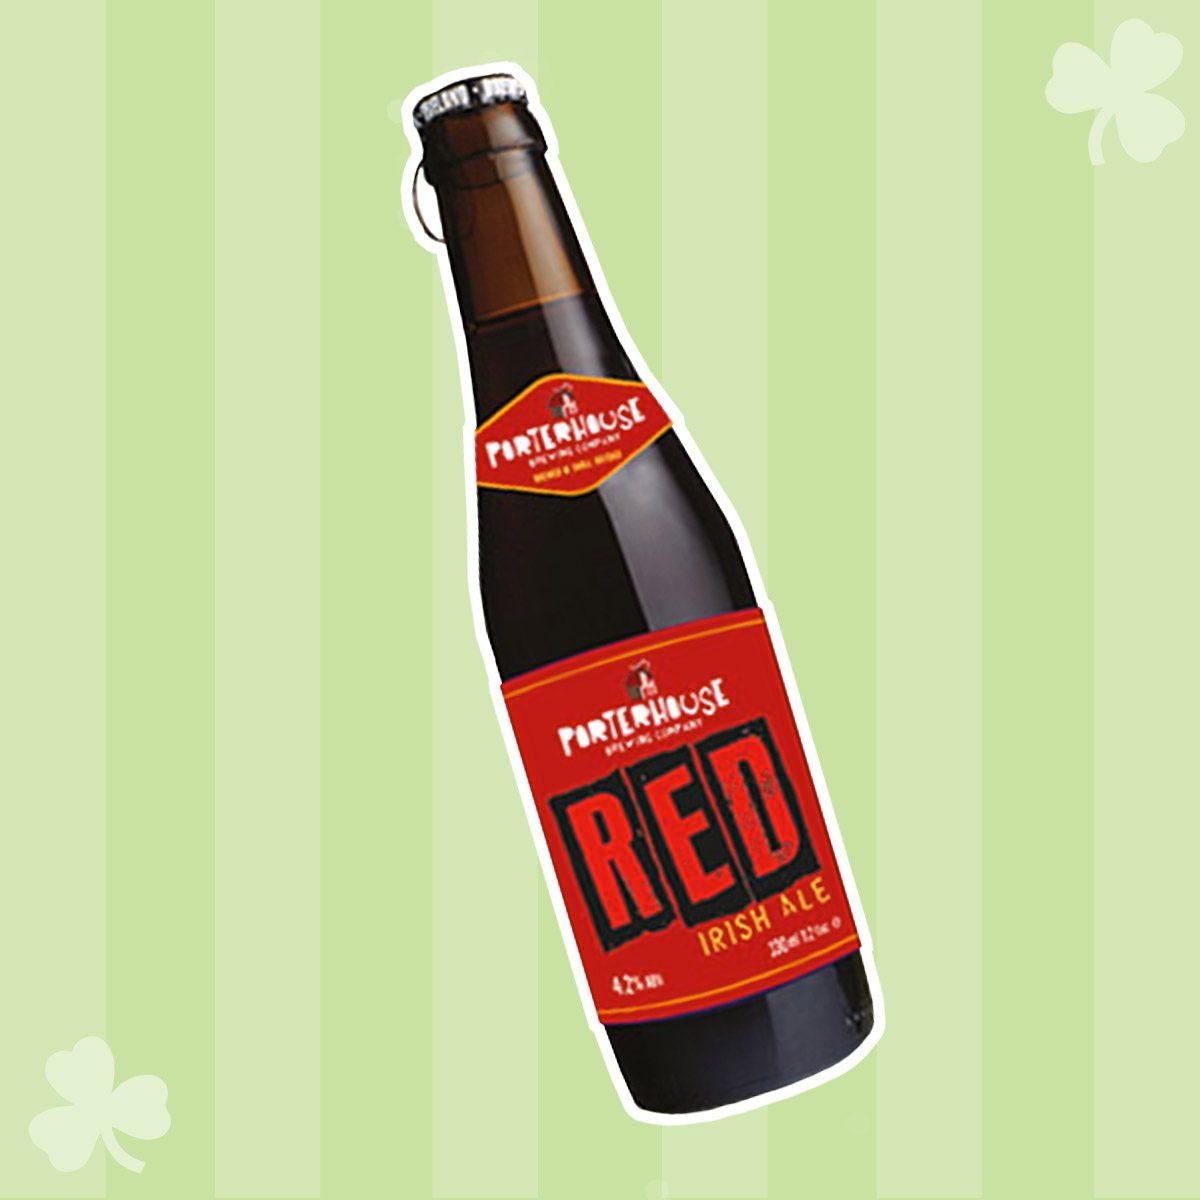 Porterhouse Red Irish Ale